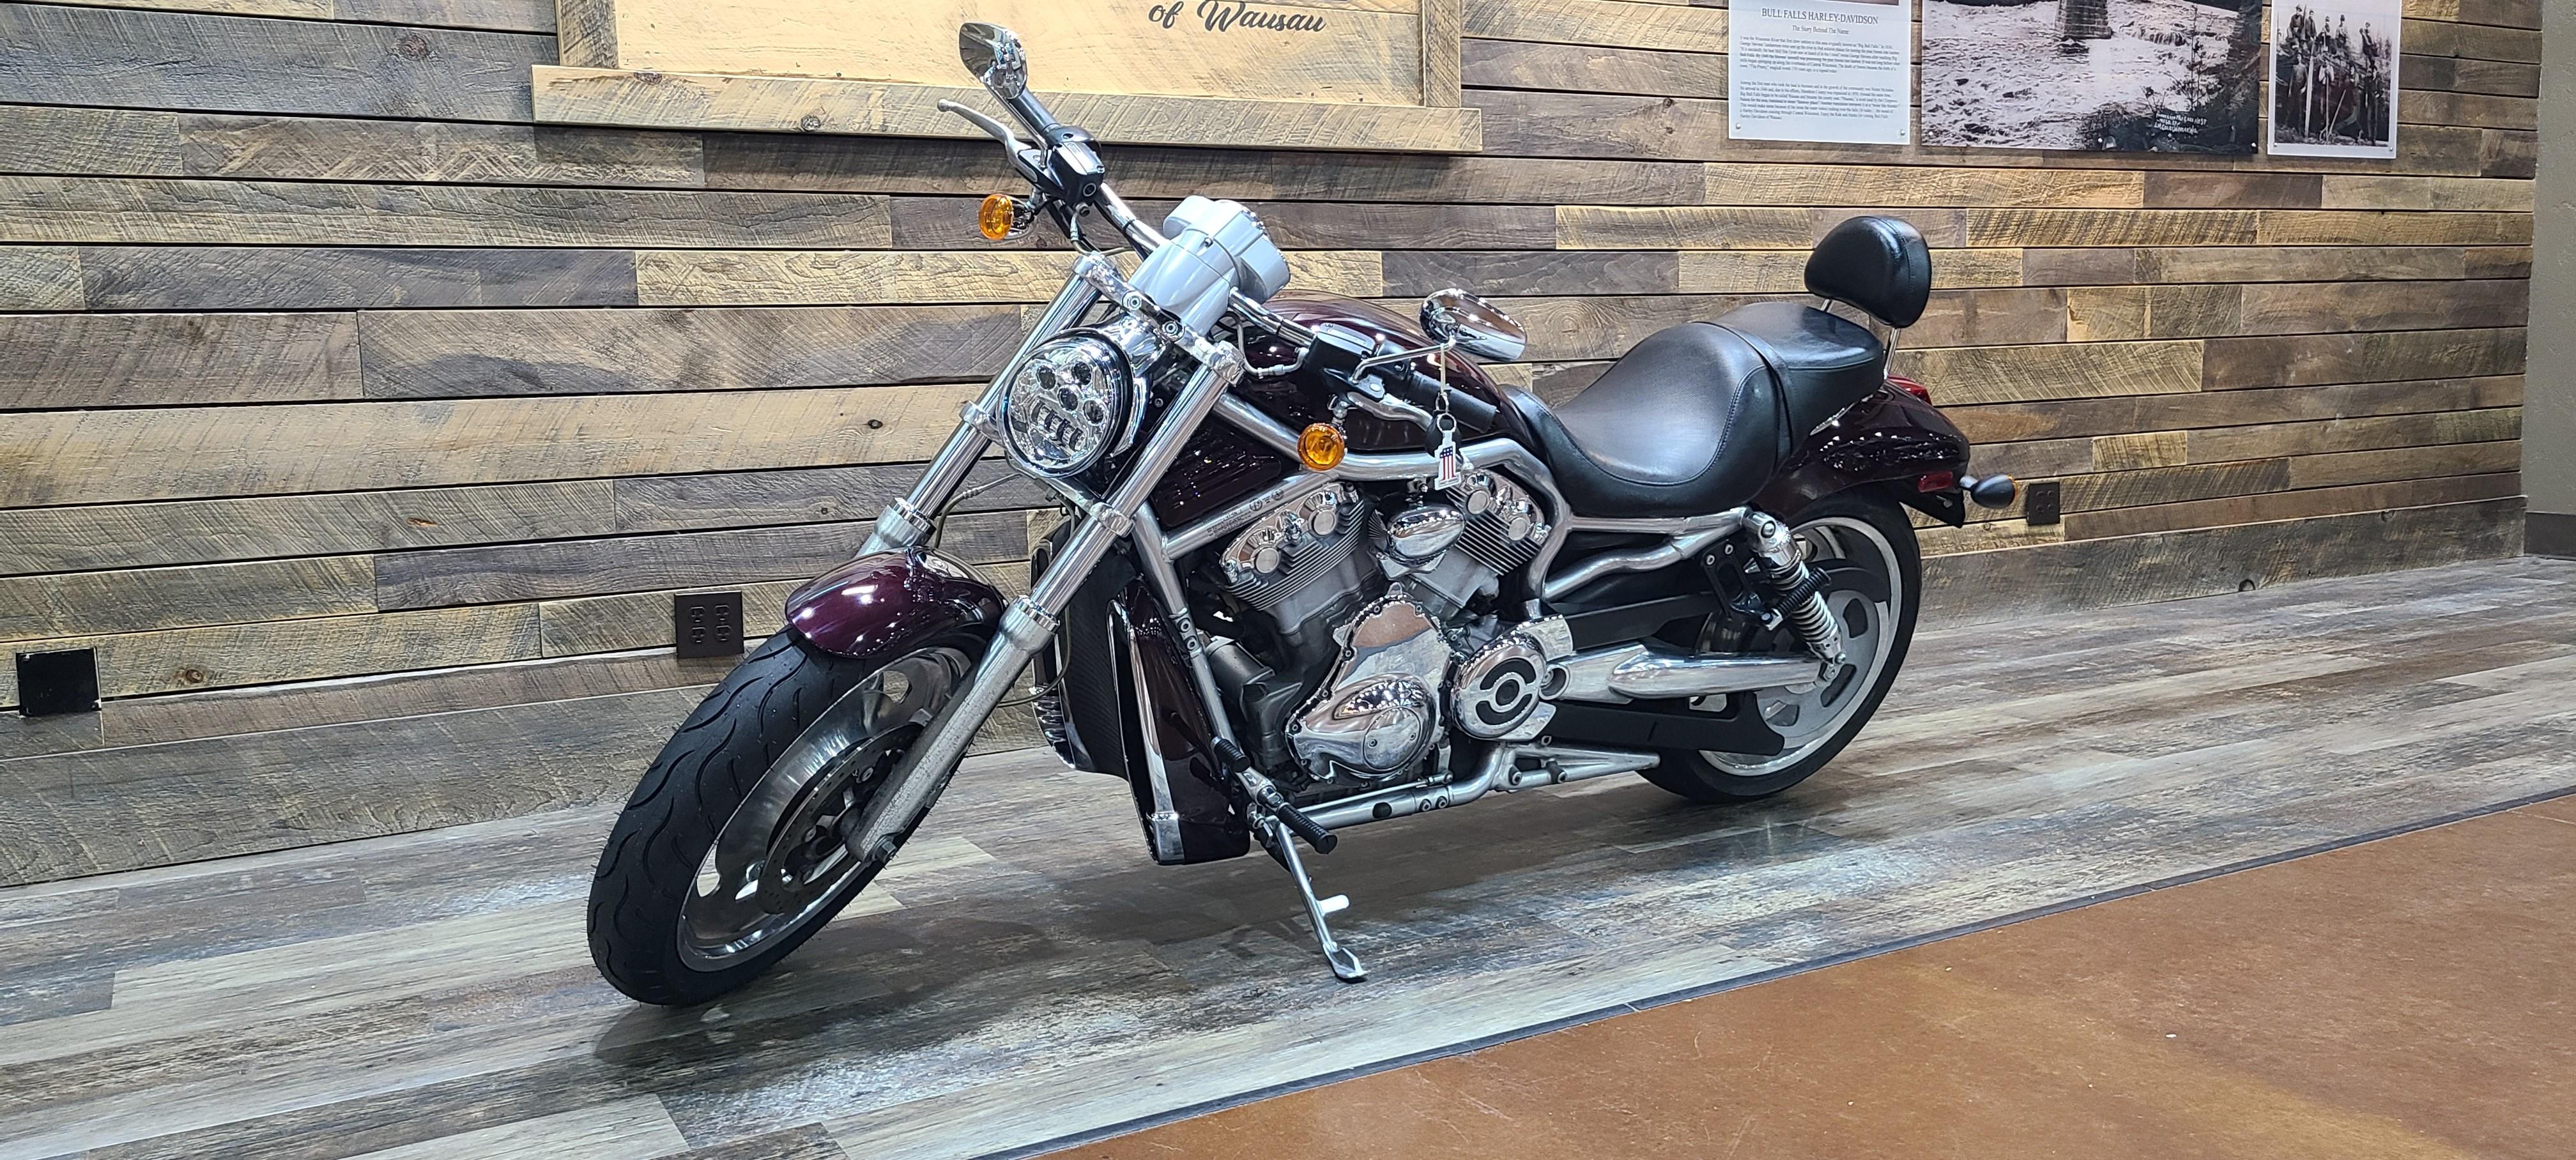 2007 Harley-Davidson VRSC A V-Rod at Bull Falls Harley-Davidson